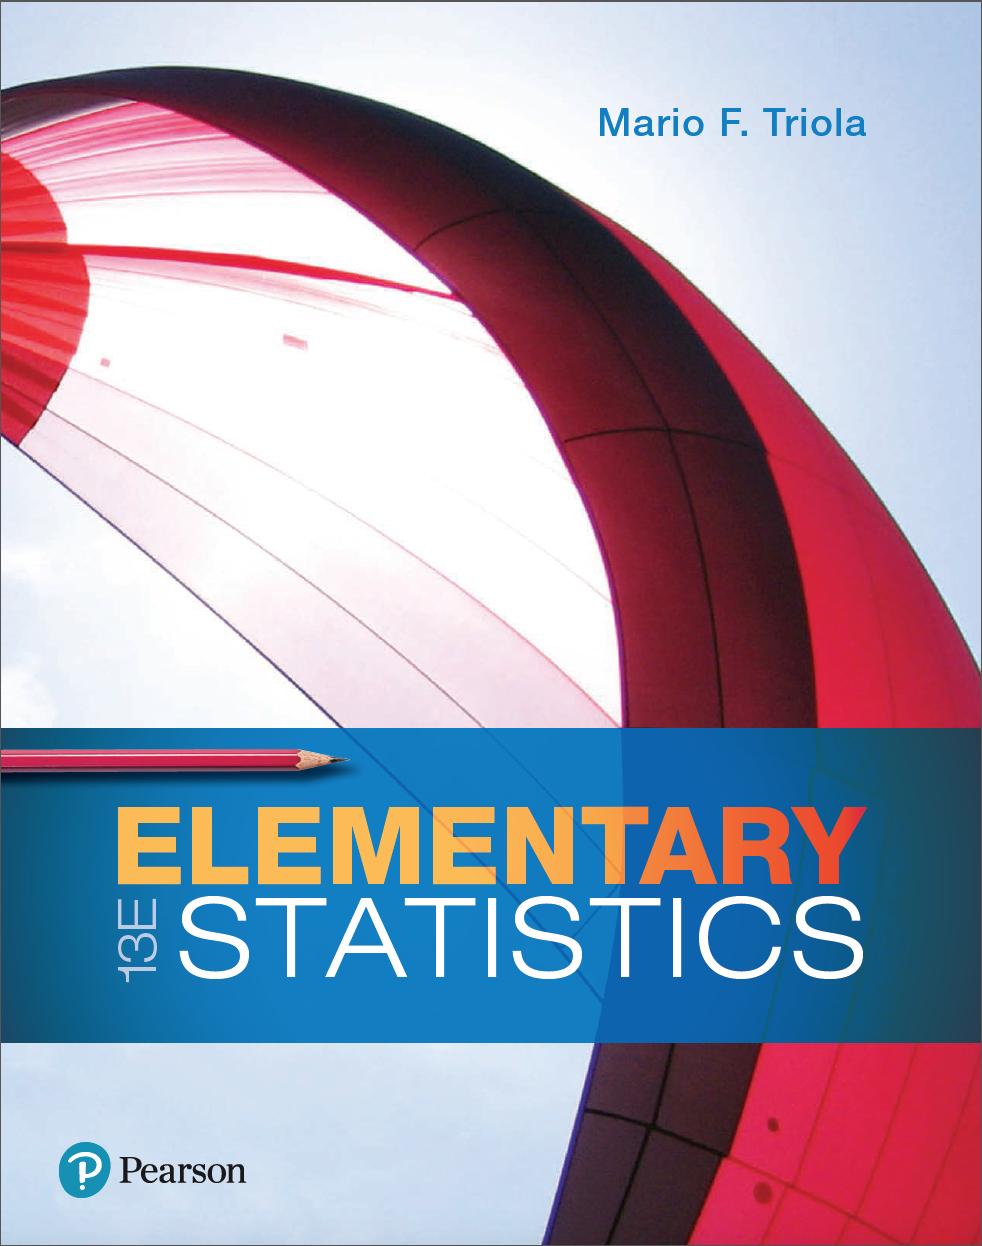 Elementary_Statistics.png